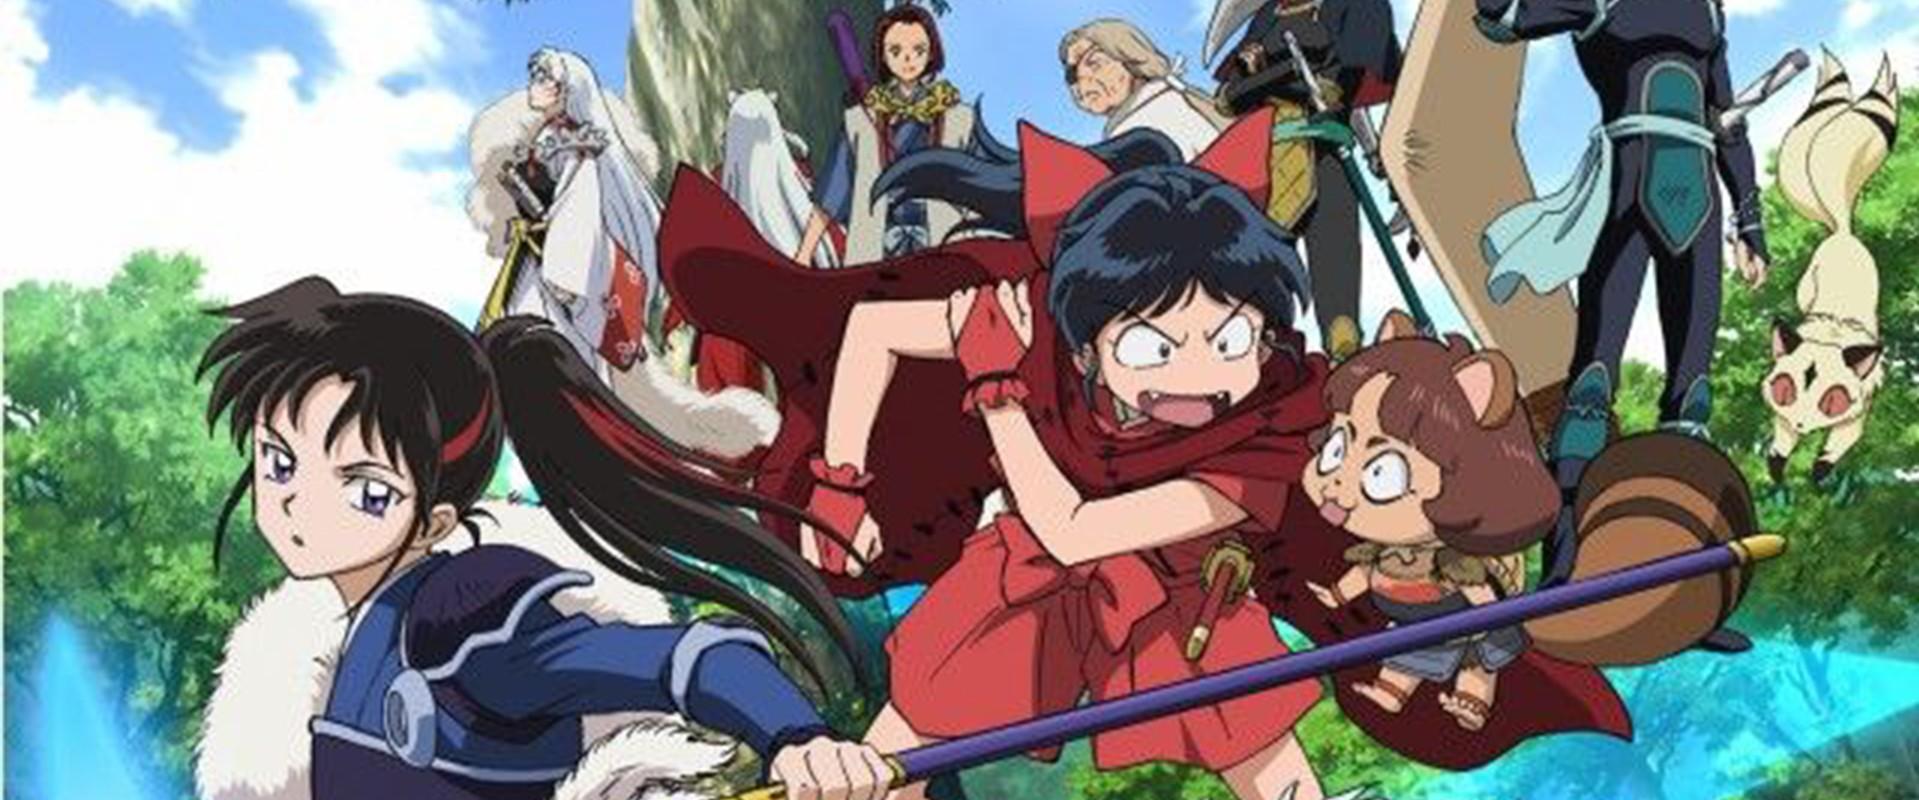 Hanyo no Yashahime : Princess Half-Demon